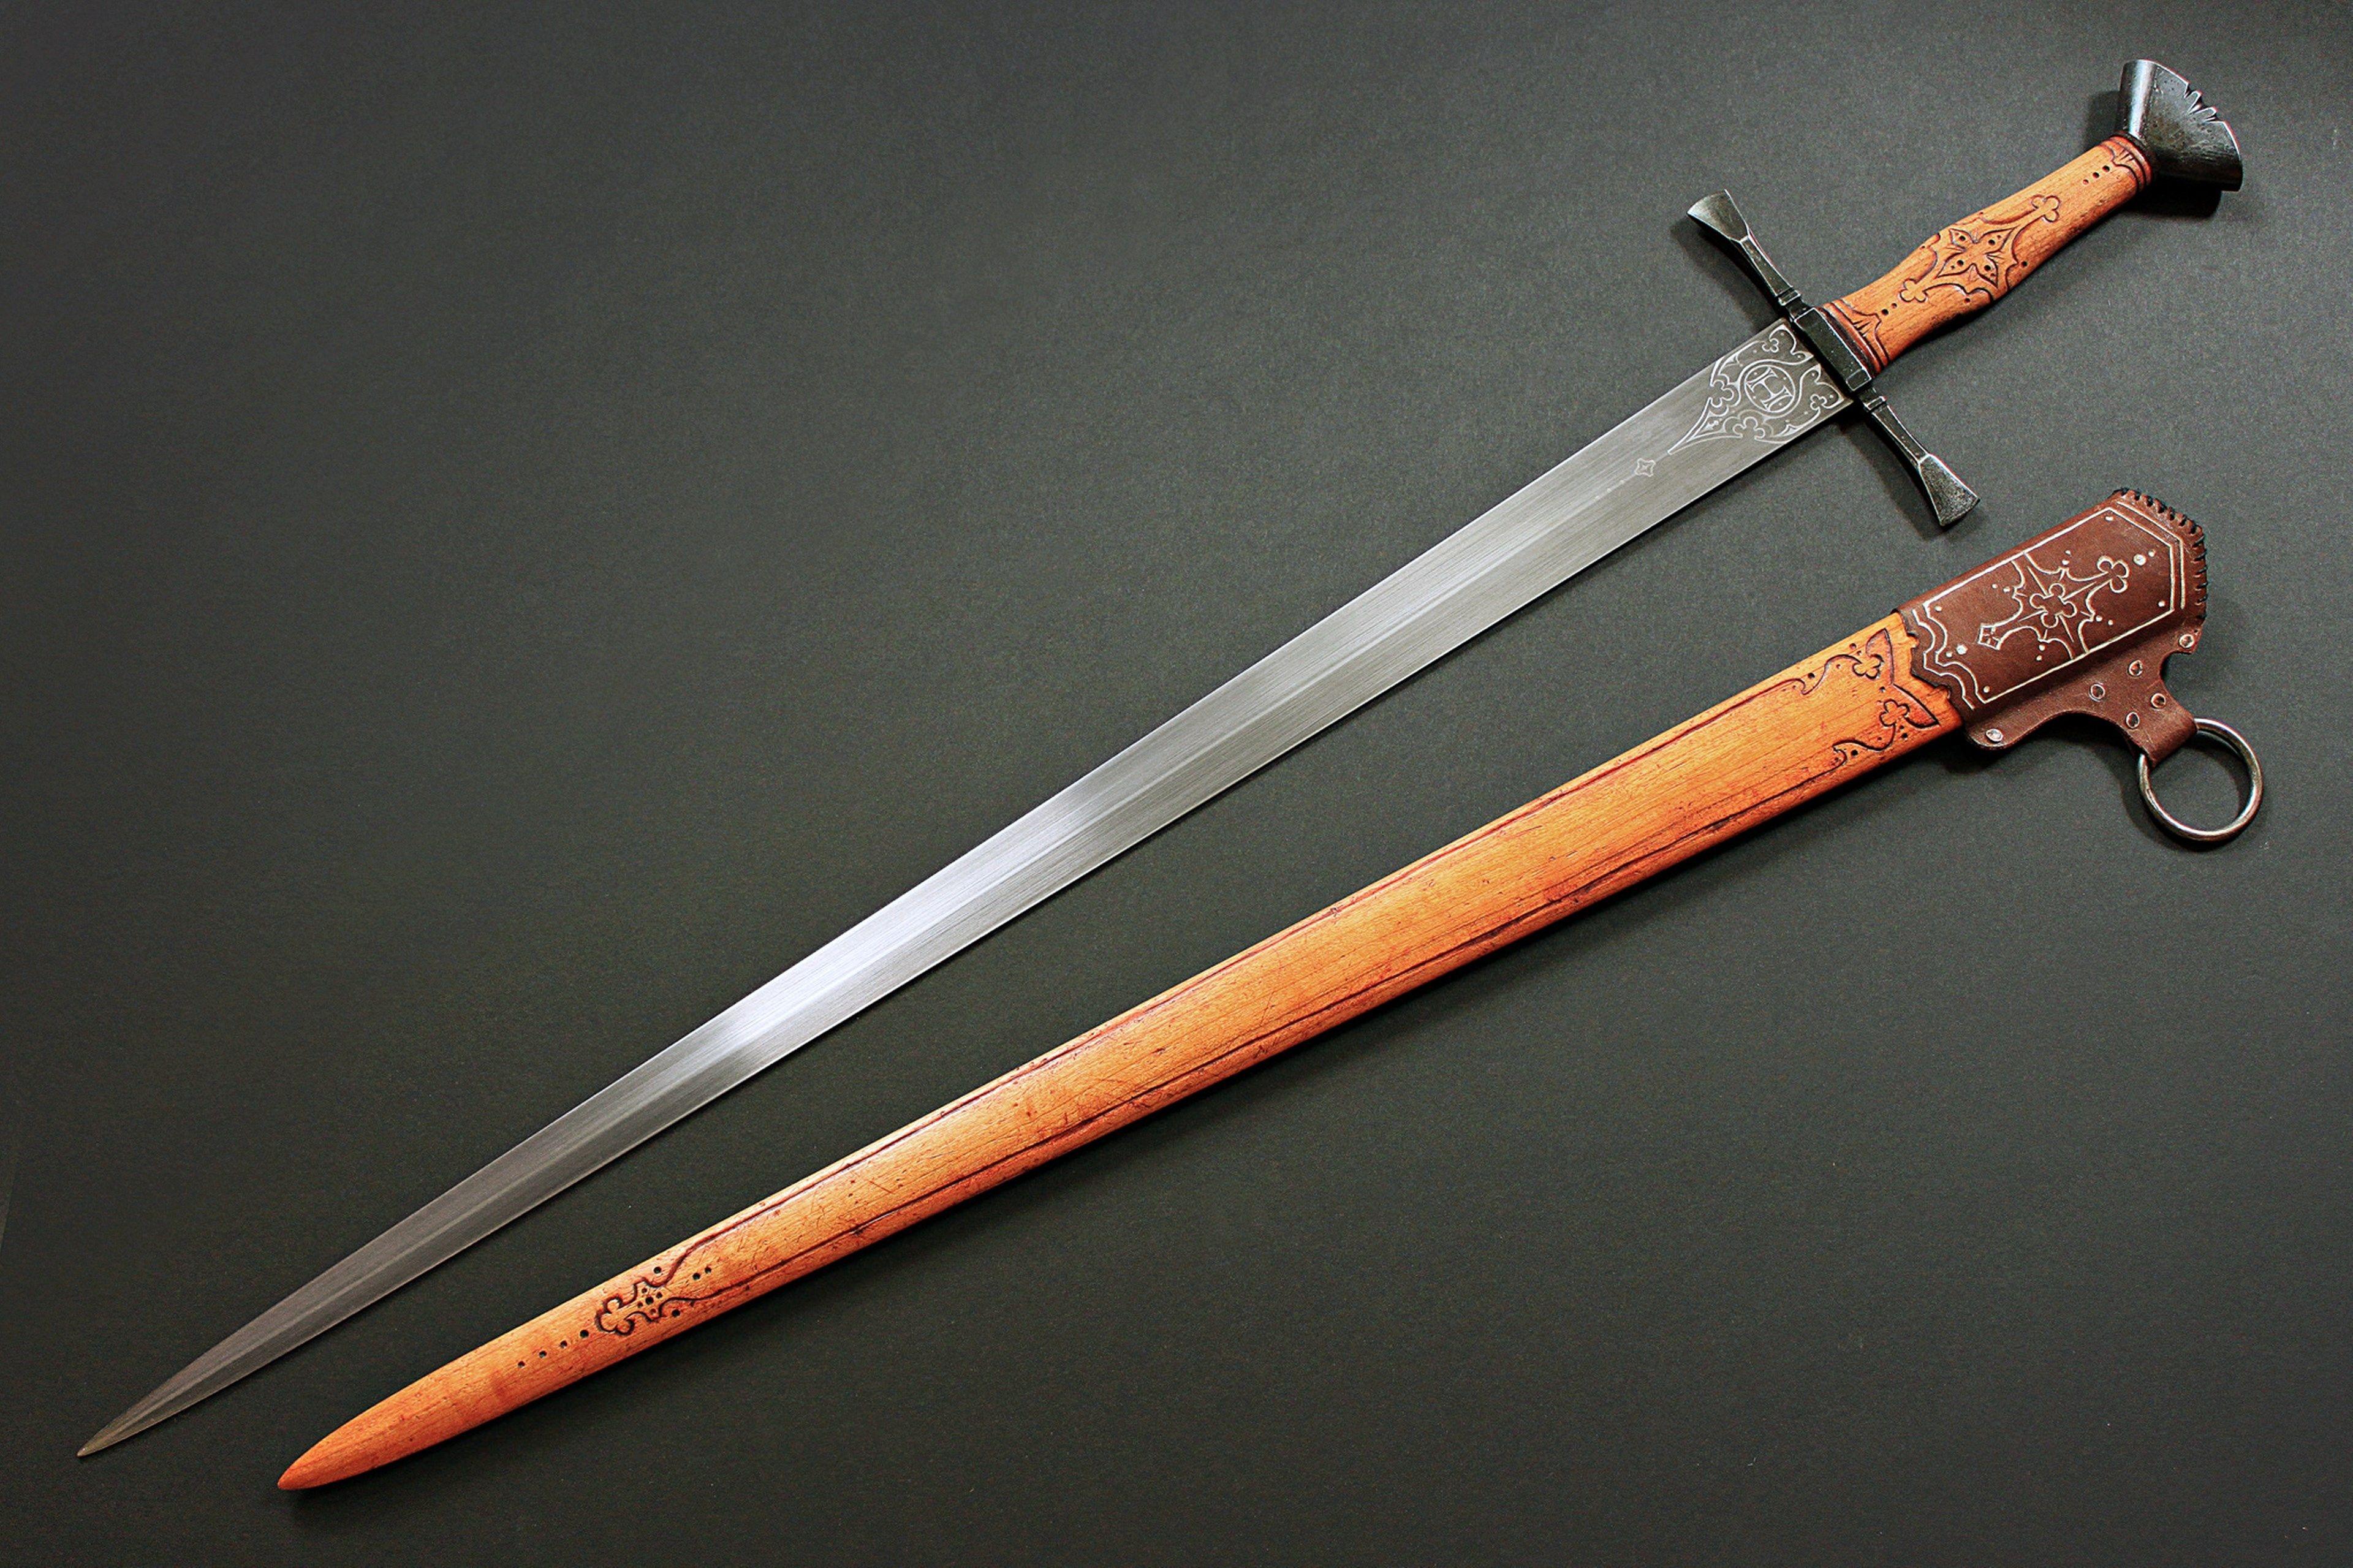 4k Heimdall Sword Hd Wallpaper 3840x2559